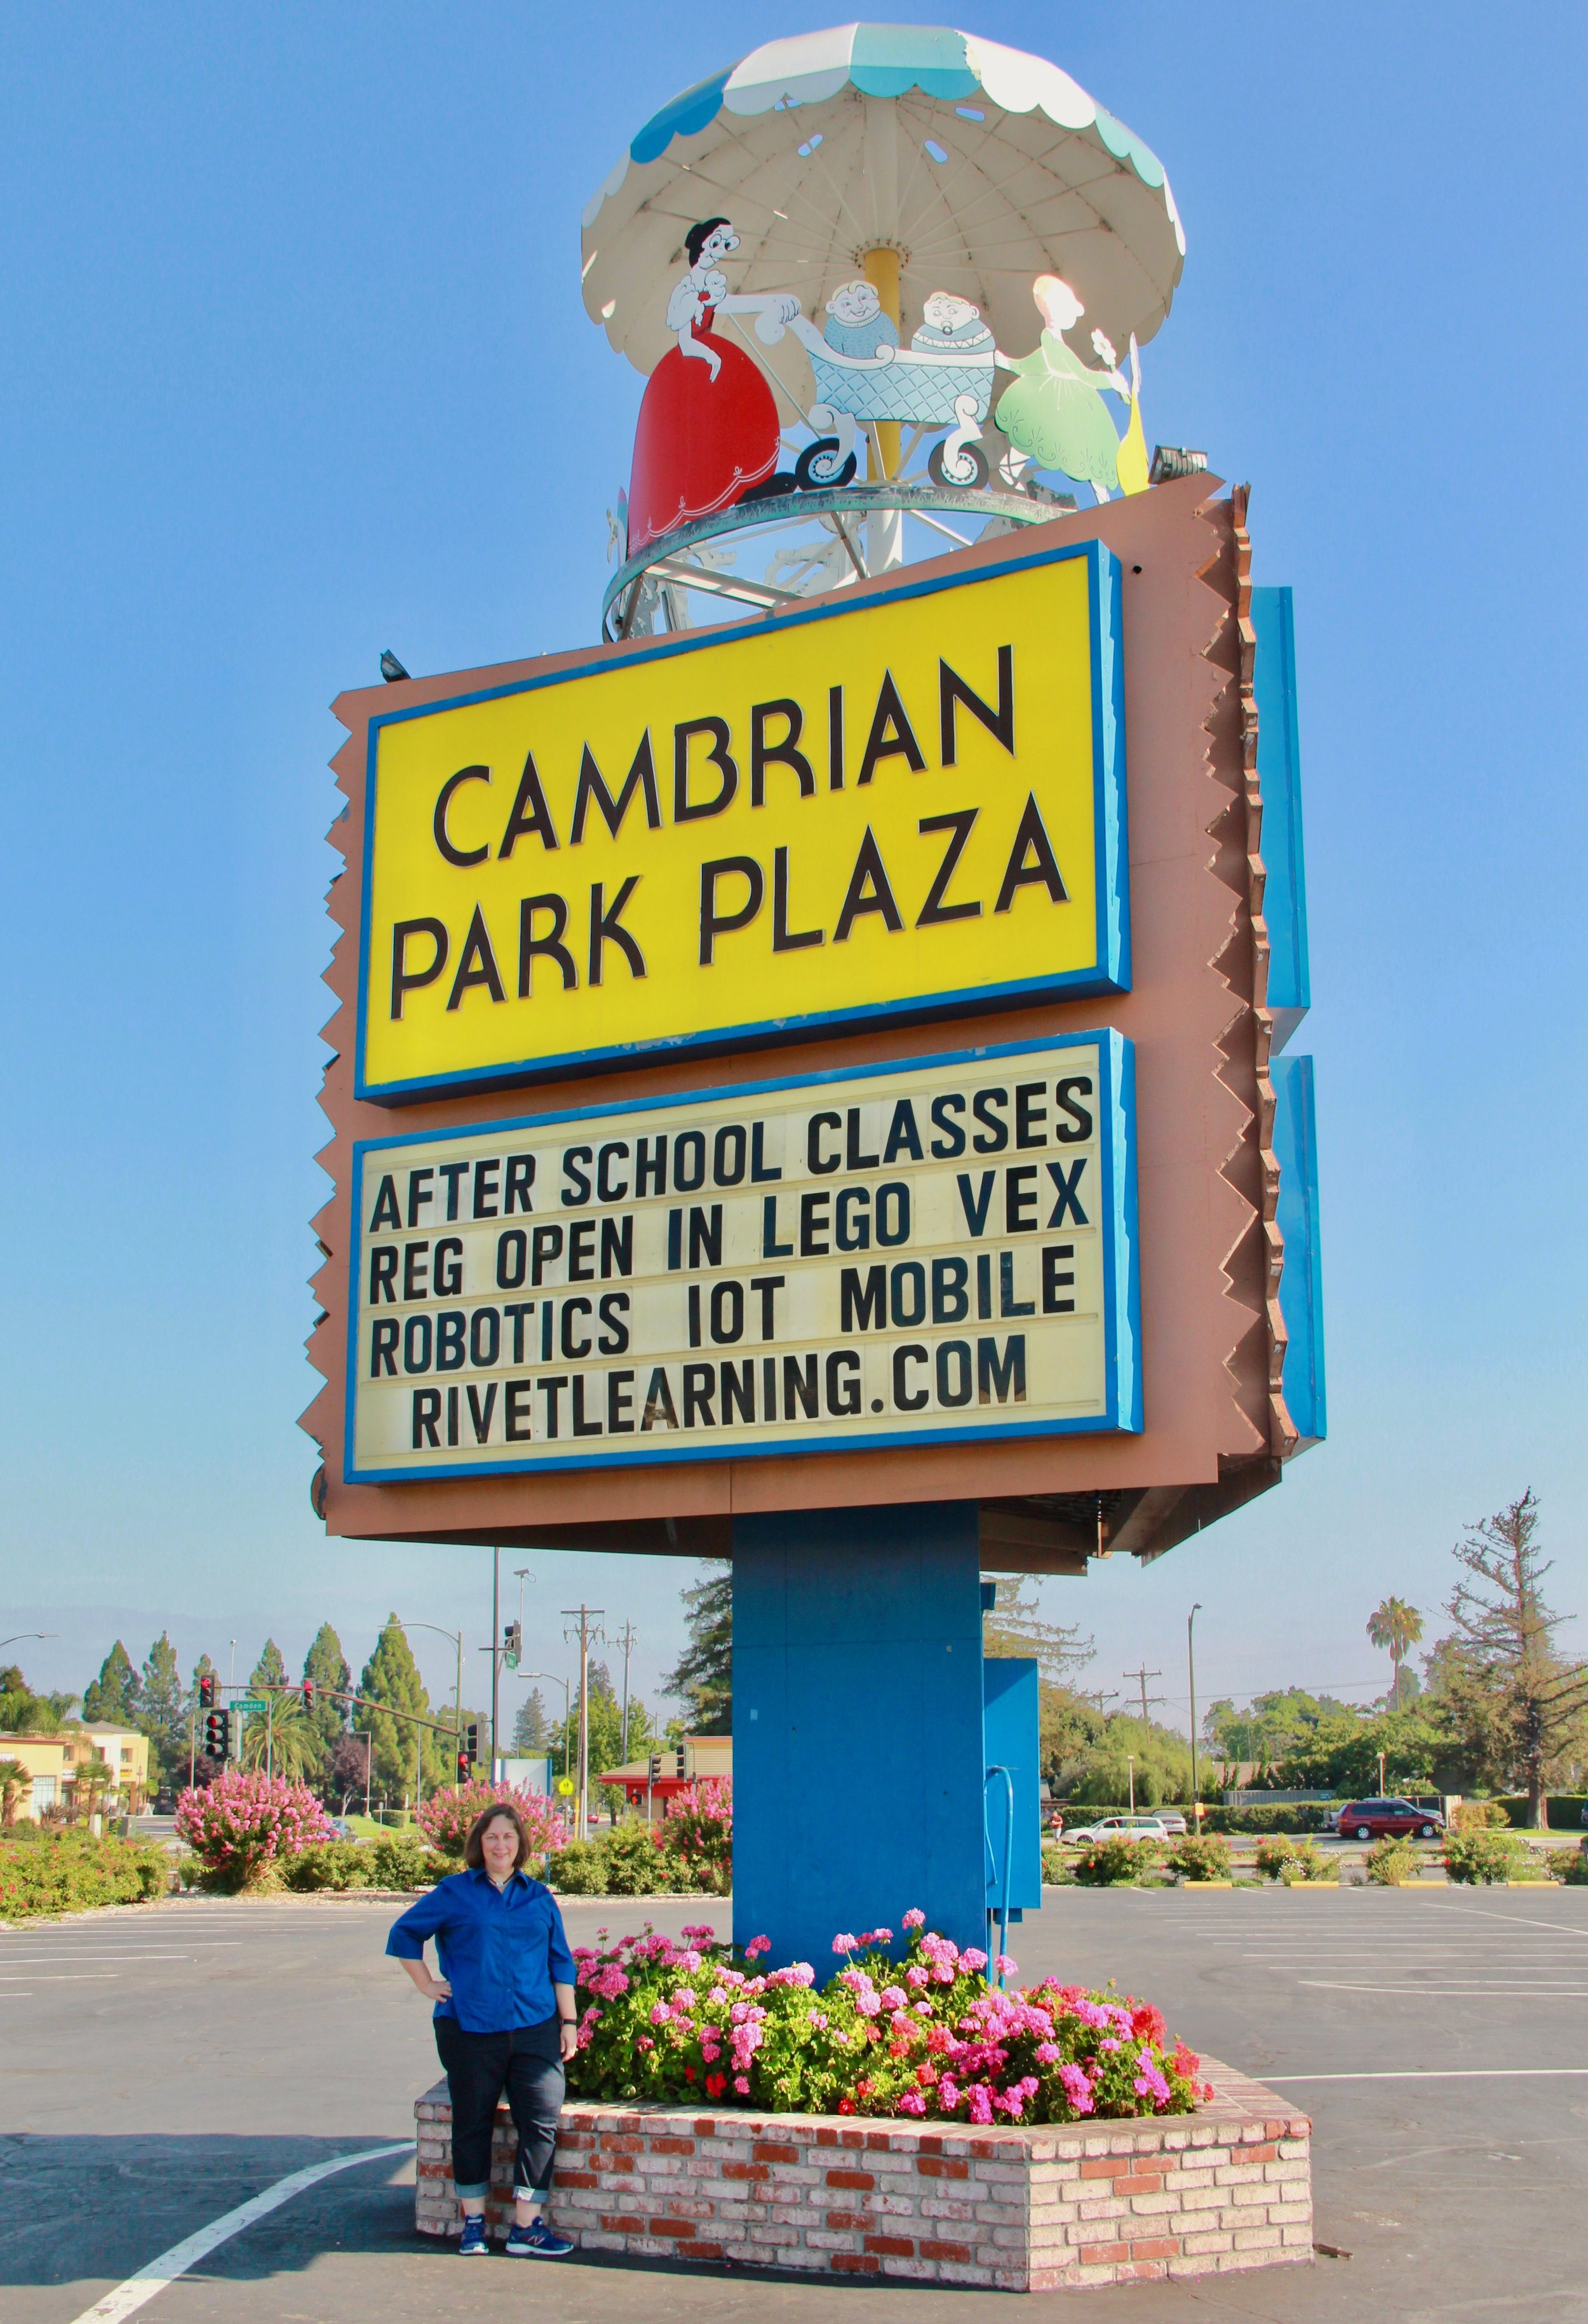 Pam Cambrian Merry Go Round.jpg